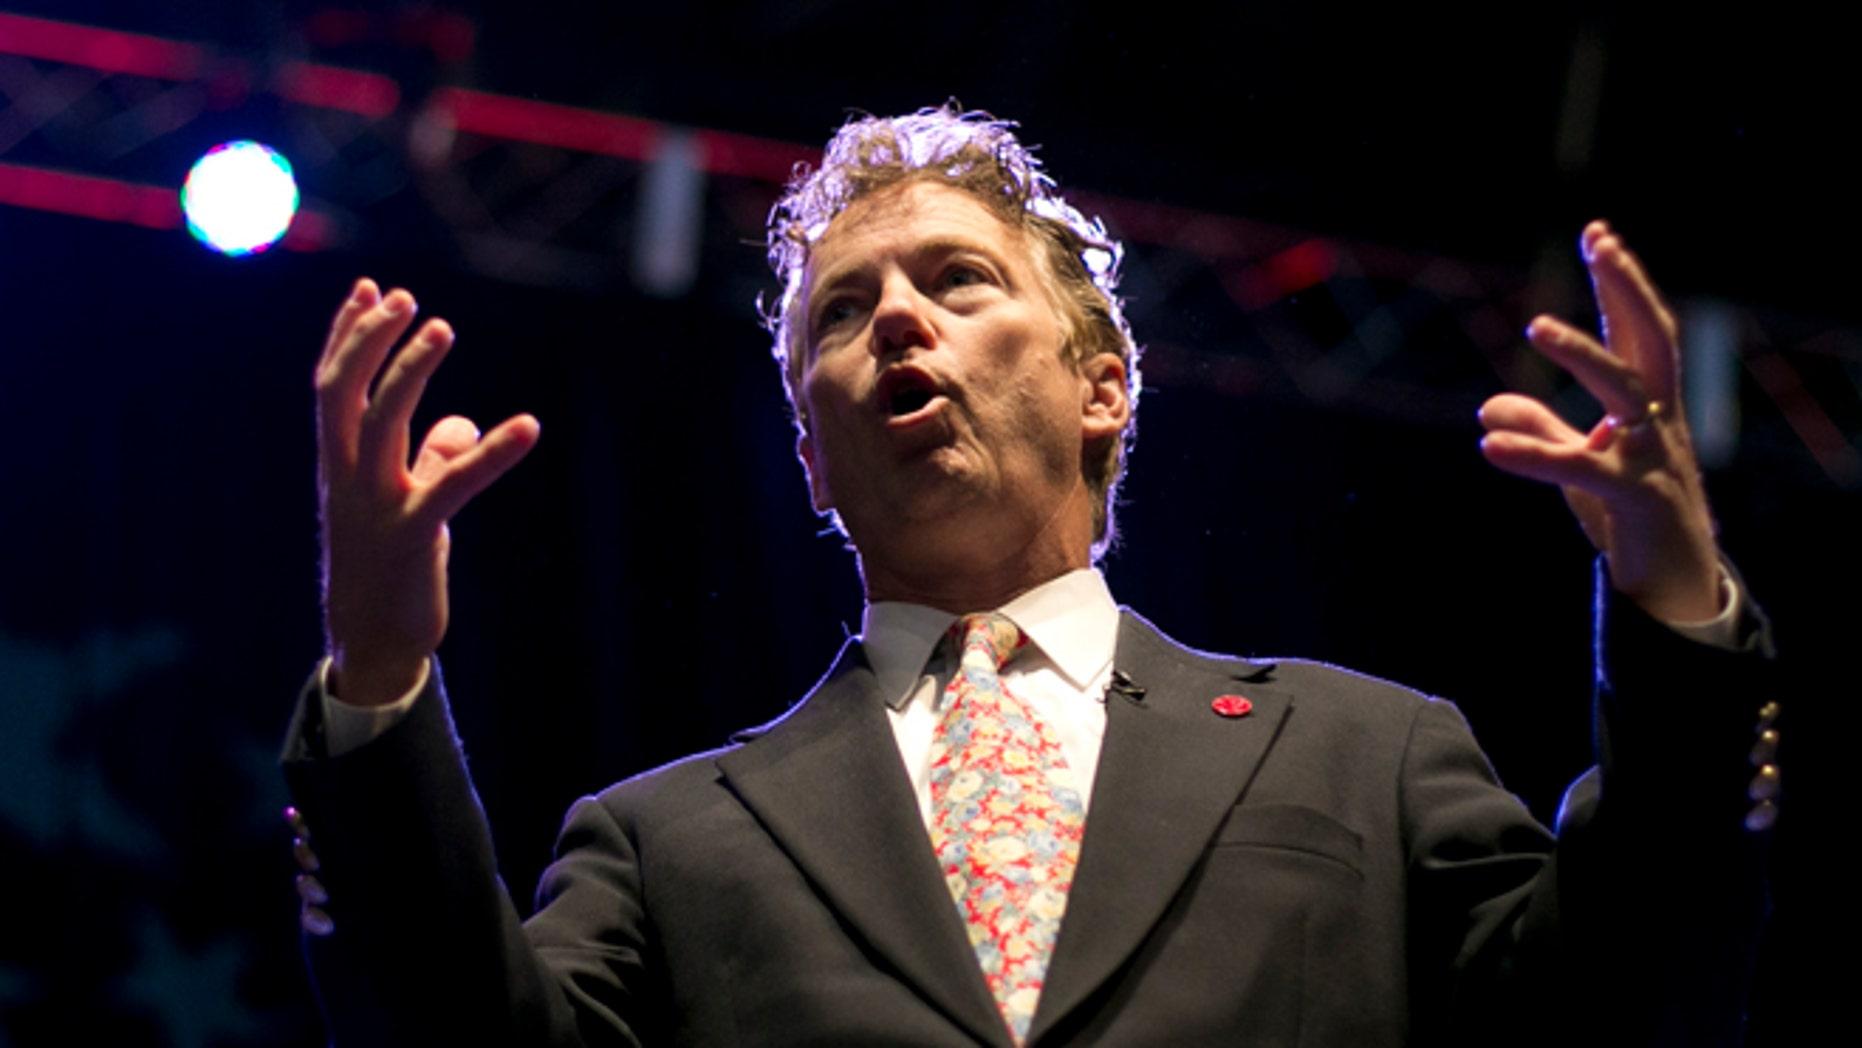 April 26, 2014: Sen. Rand Paul, R-Kentucky, speaks at the Maine Republican Convention, Bangor, Maine.